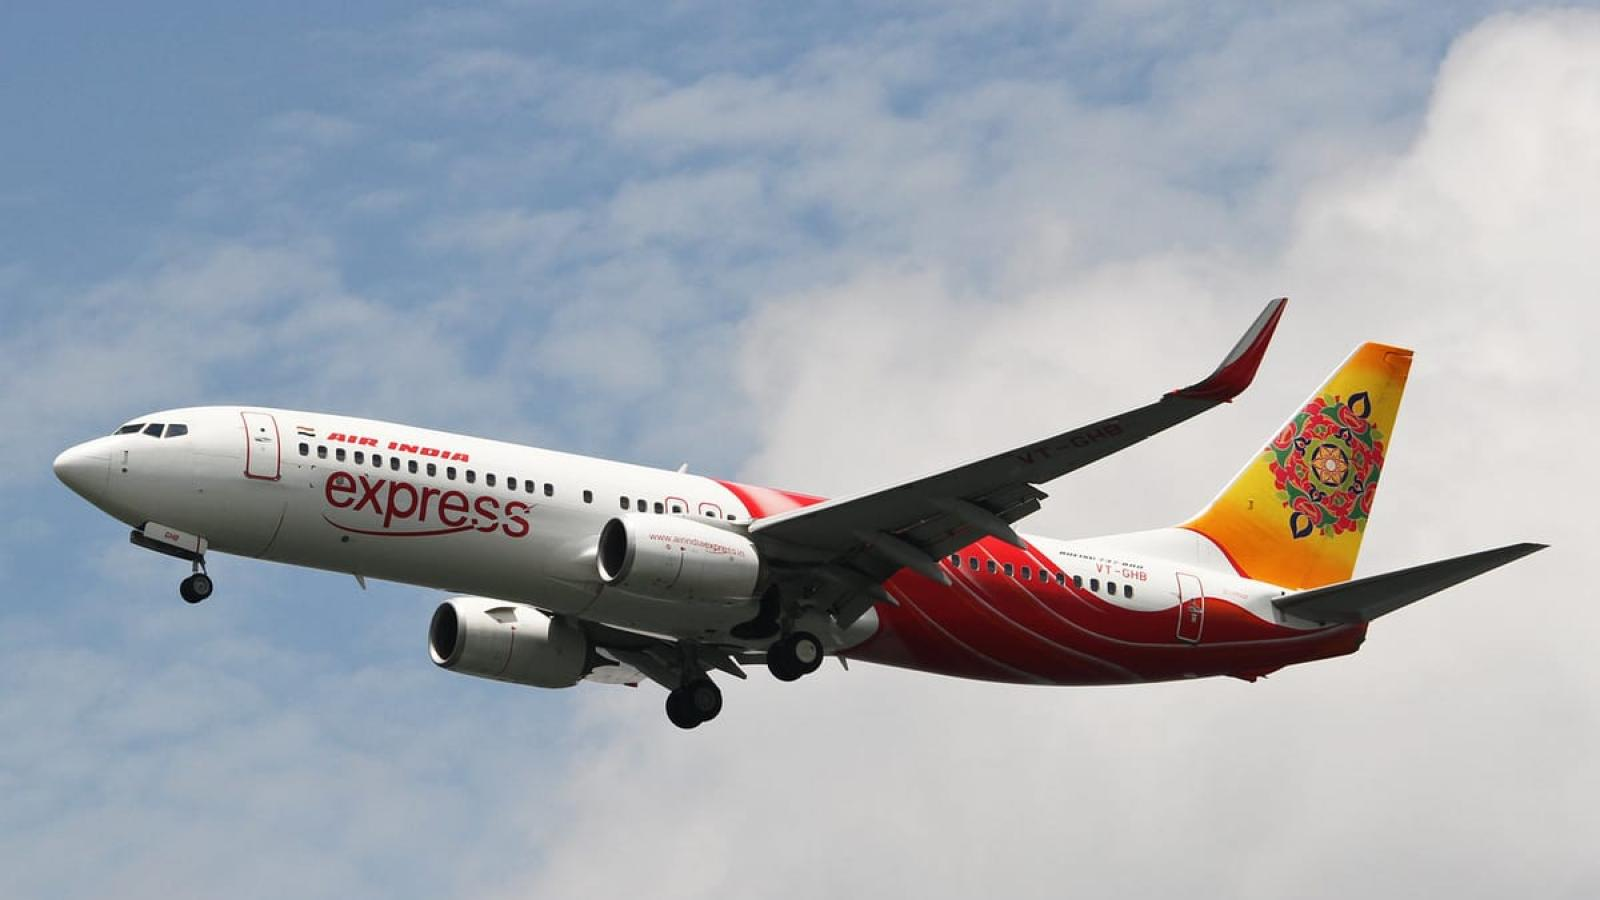 Air India to operate three additional direct flights to Kochi, Hyderabad and Mumbai